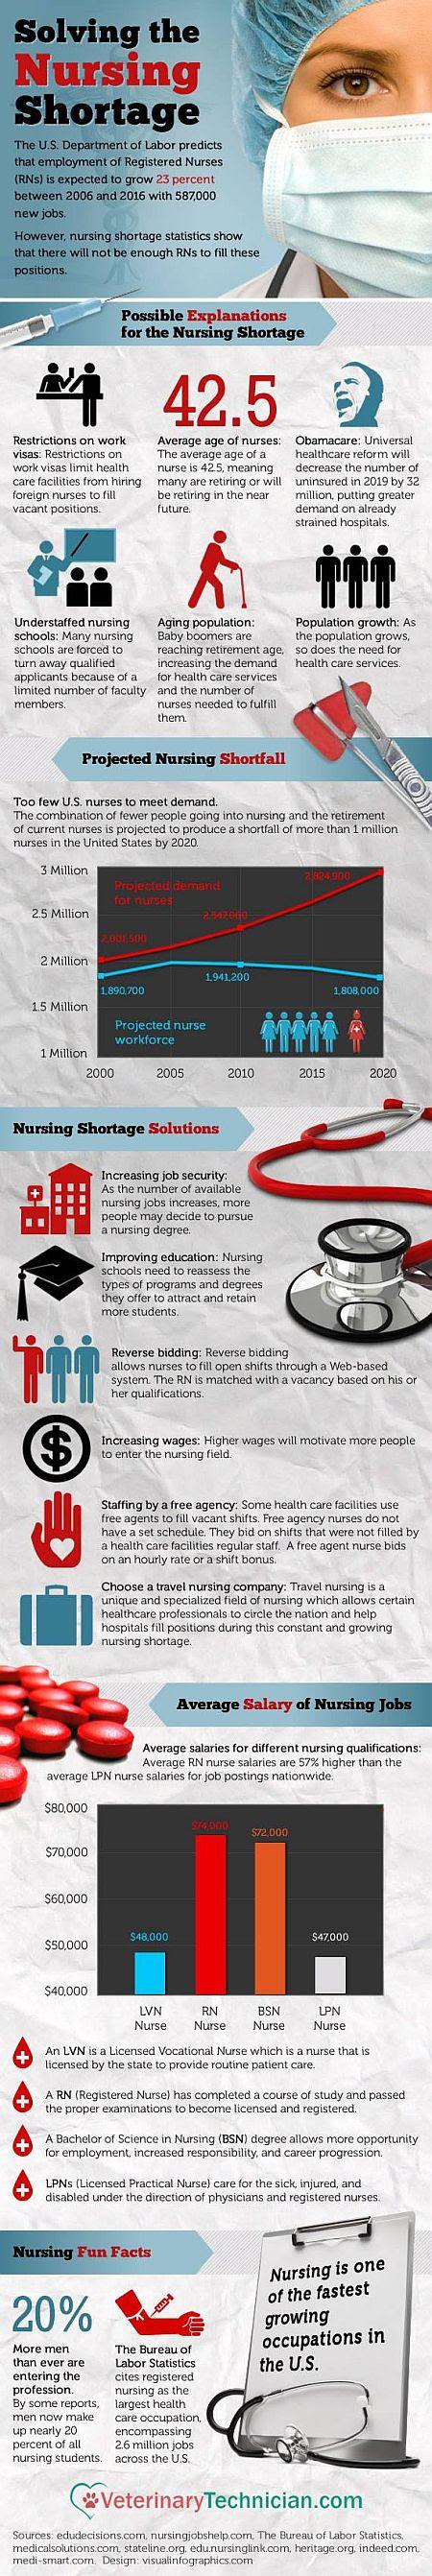 Solving the Nursing Shortage Crisis